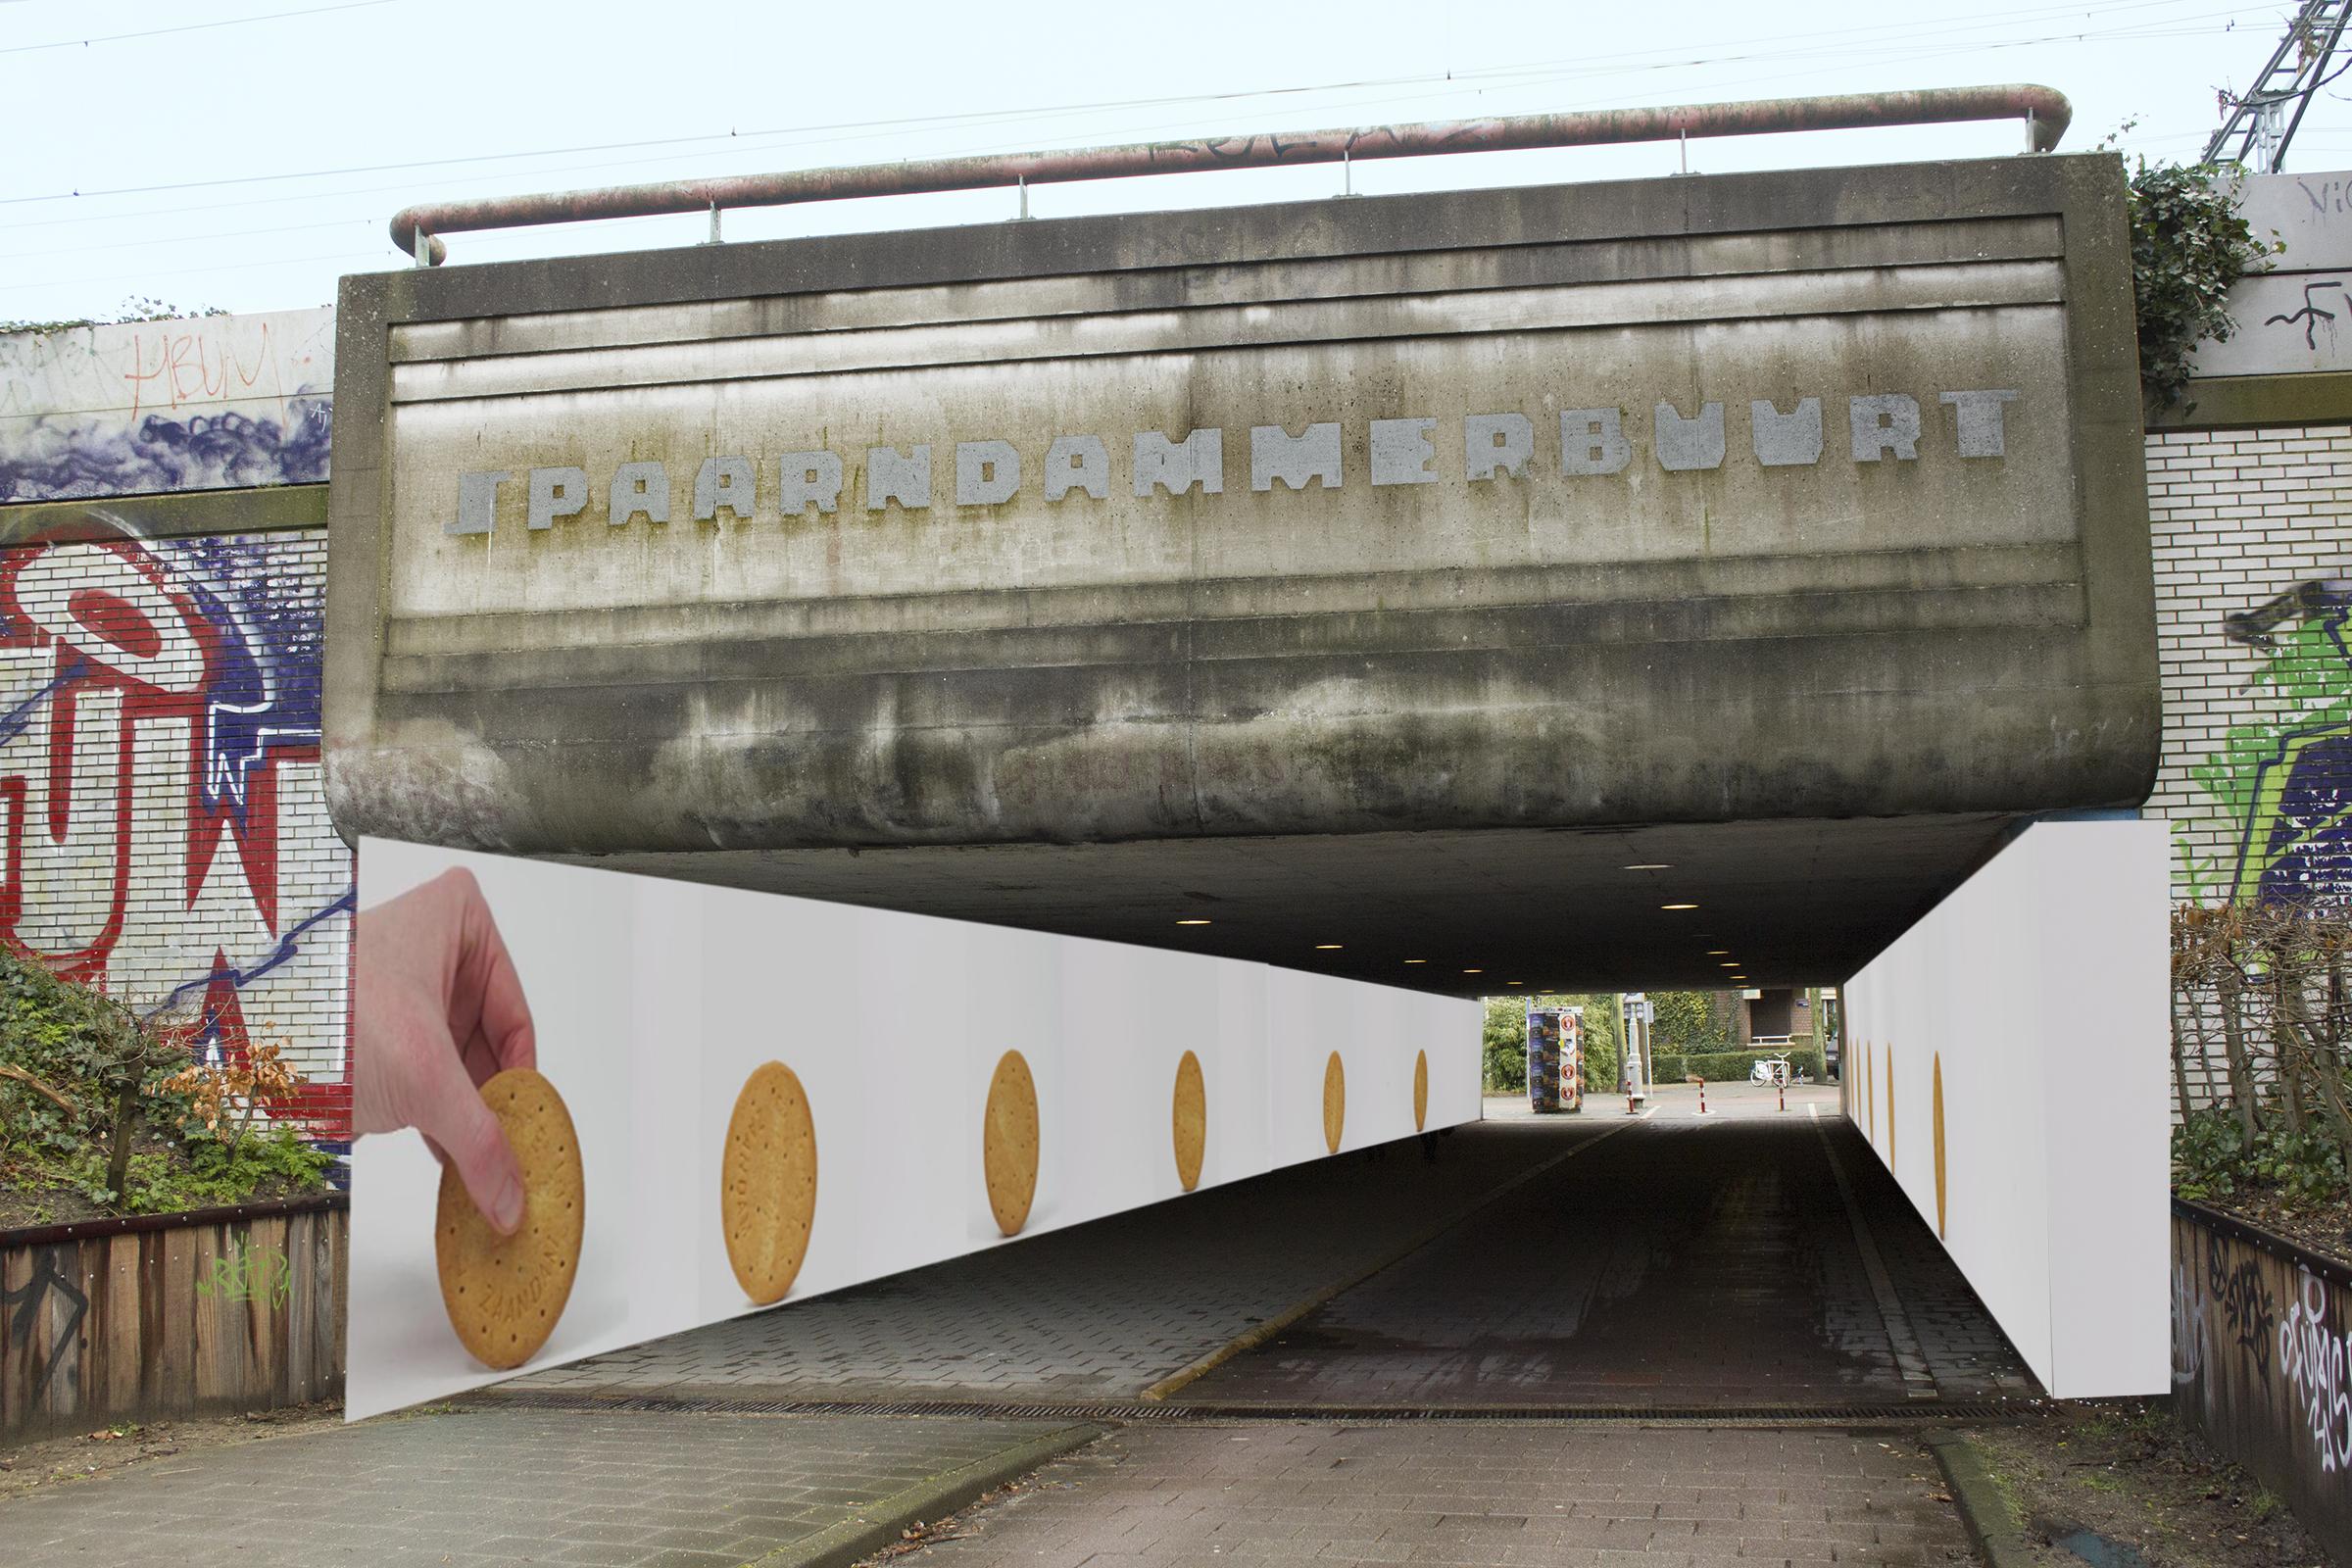 Koekjestunnel_Tunneltje Westerpark_MariekeGelissen_overzicht